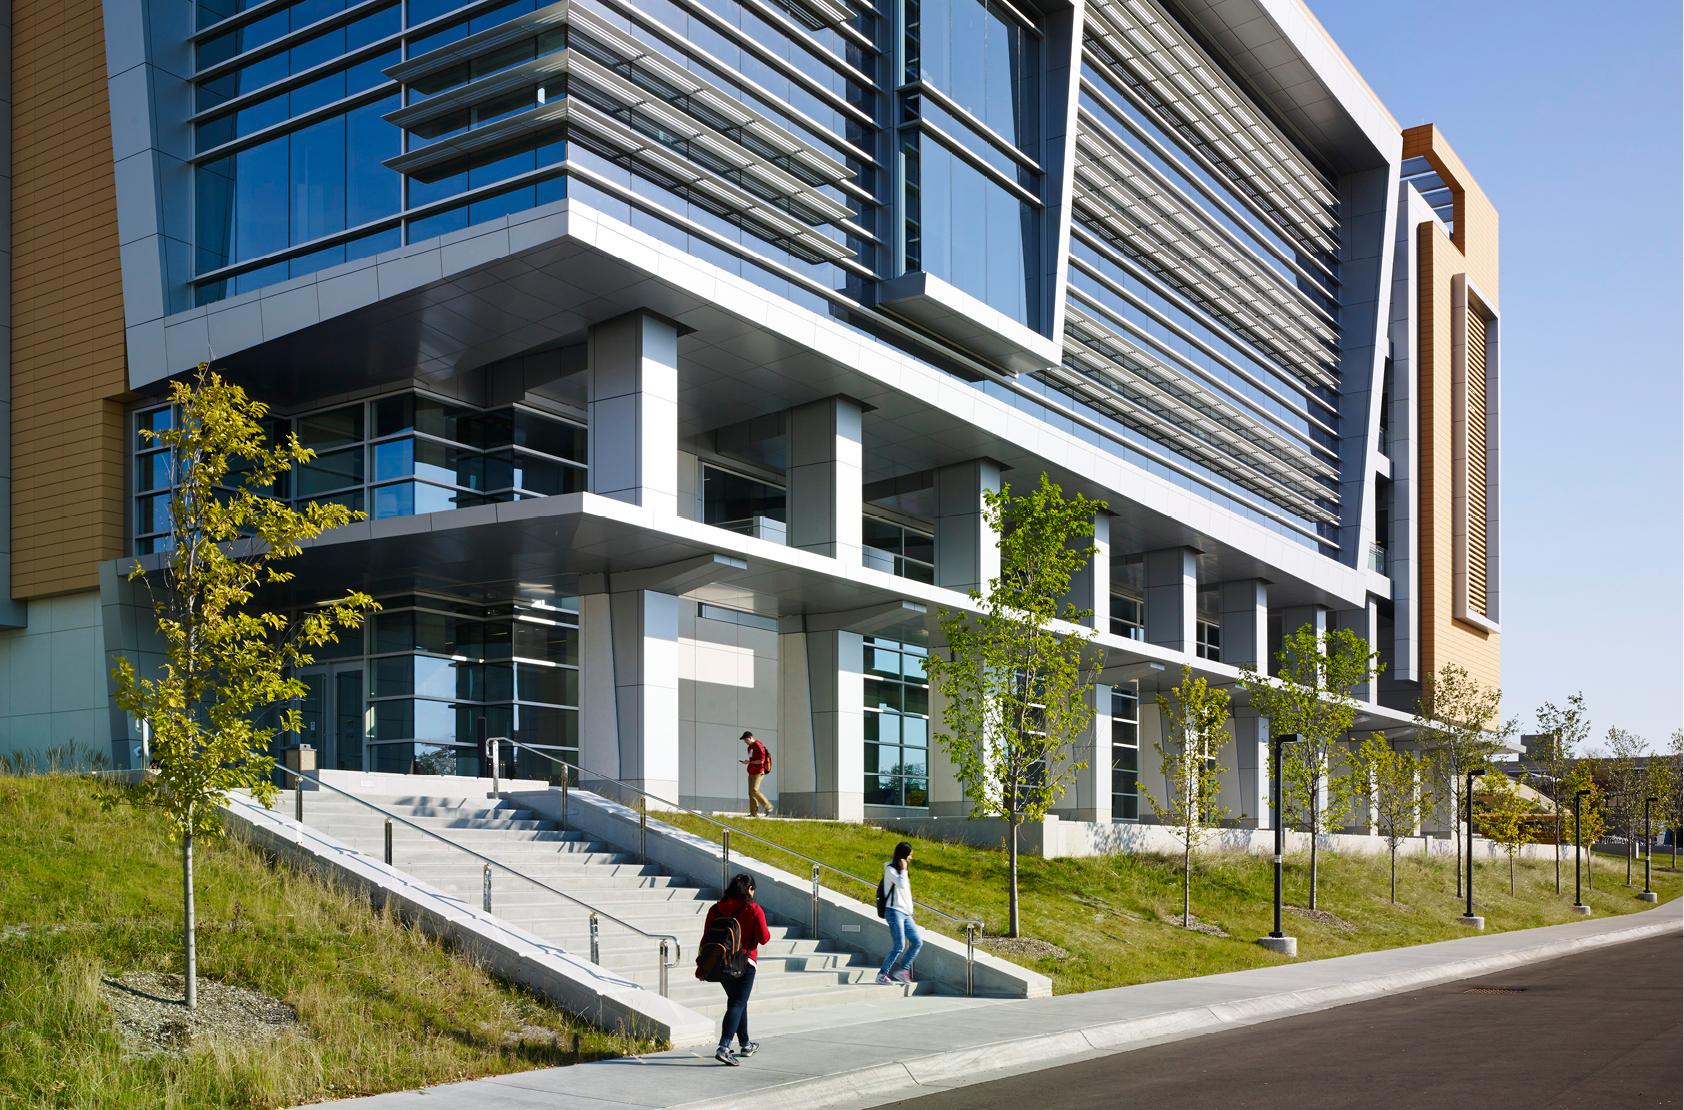 University of Wisconsin, Milwaukee - Kenwood Interdisciplinary Research Center